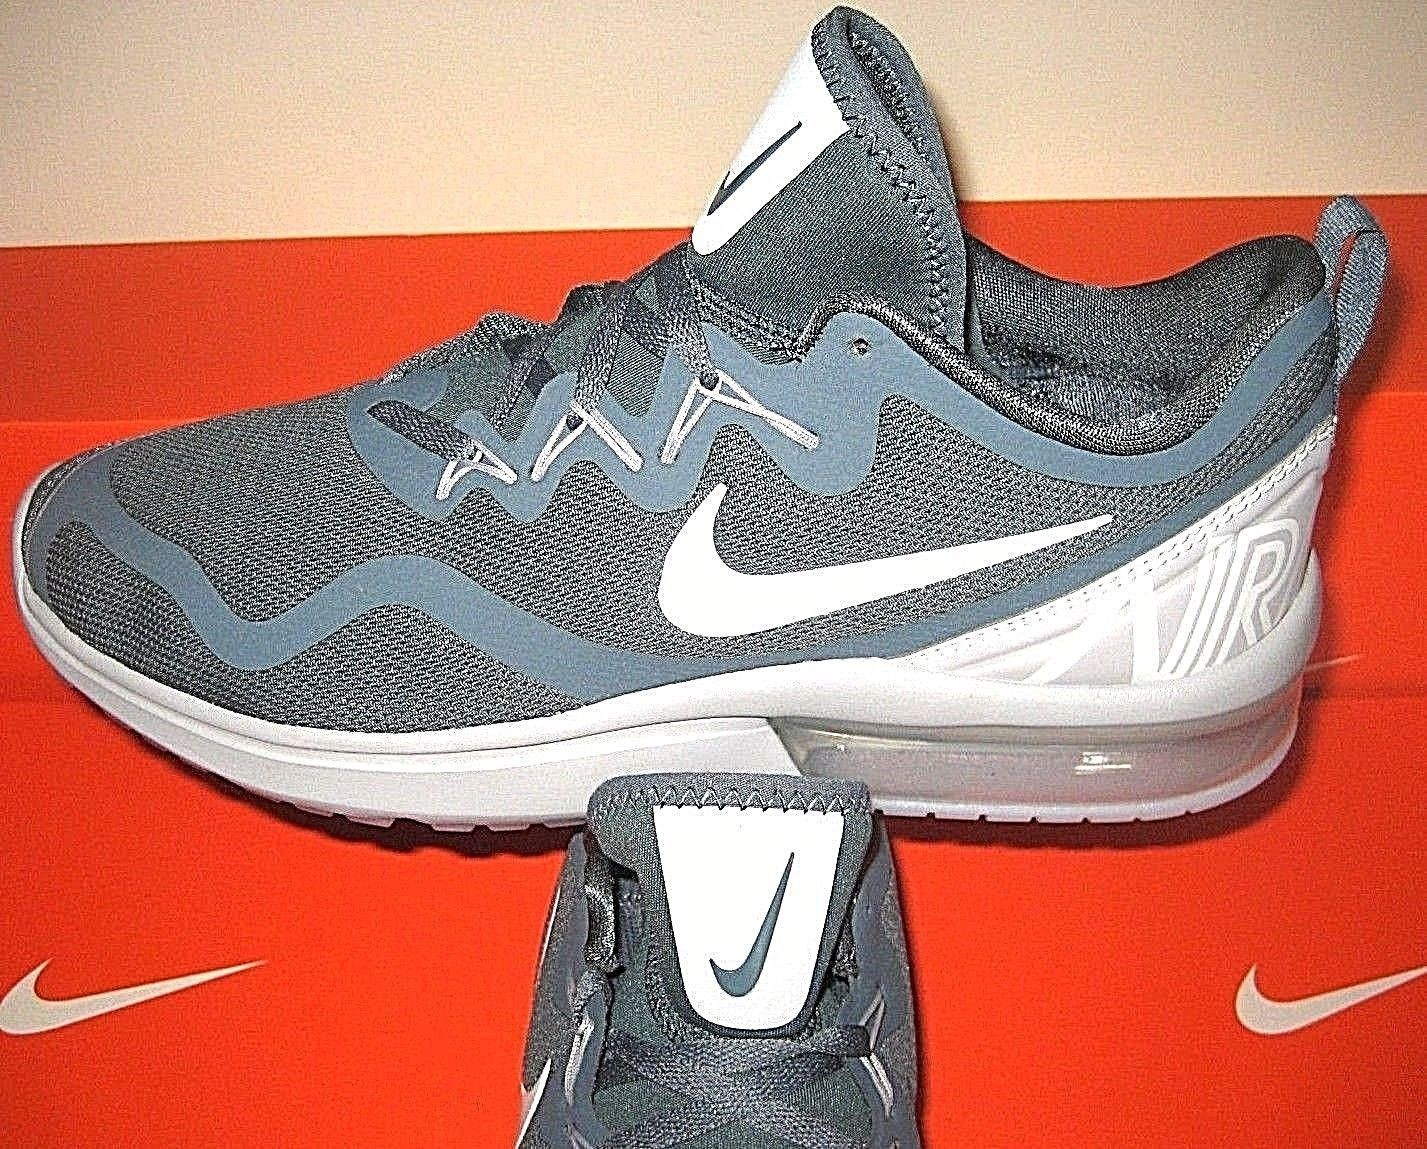 c0138c90b6b5d S l1600. S l1600. Nike Mens Air Max Fury Running Shoes Blue Fox Pure  Platinum Size 10.5 AA5739 403 ...